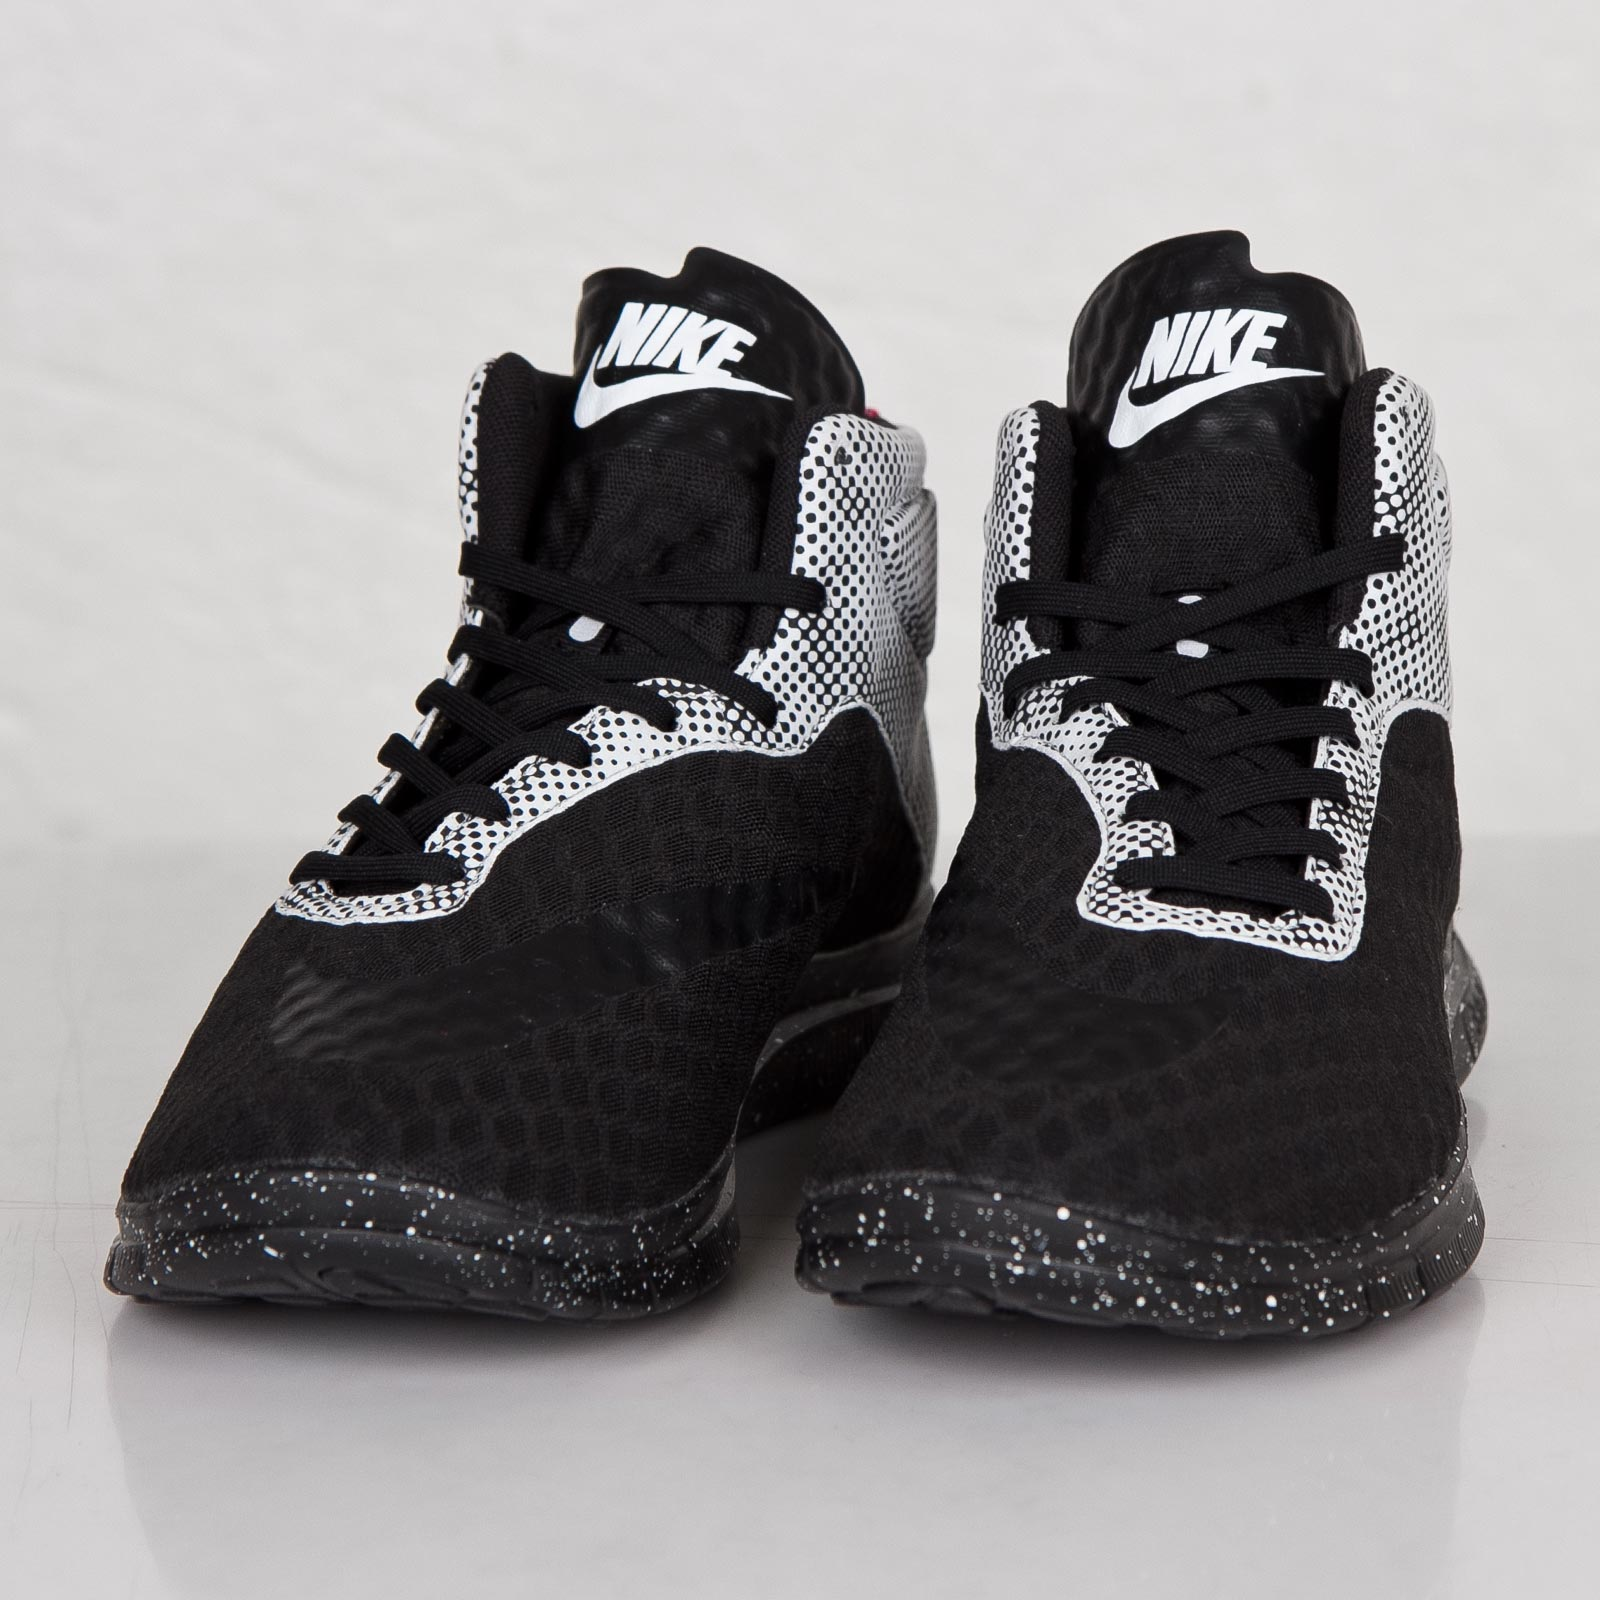 detailed pictures 813f6 1ea22 Nike Free Hypervenom Mid QS - 706569-002 - Sneakersnstuff   sneakers    streetwear online since 1999